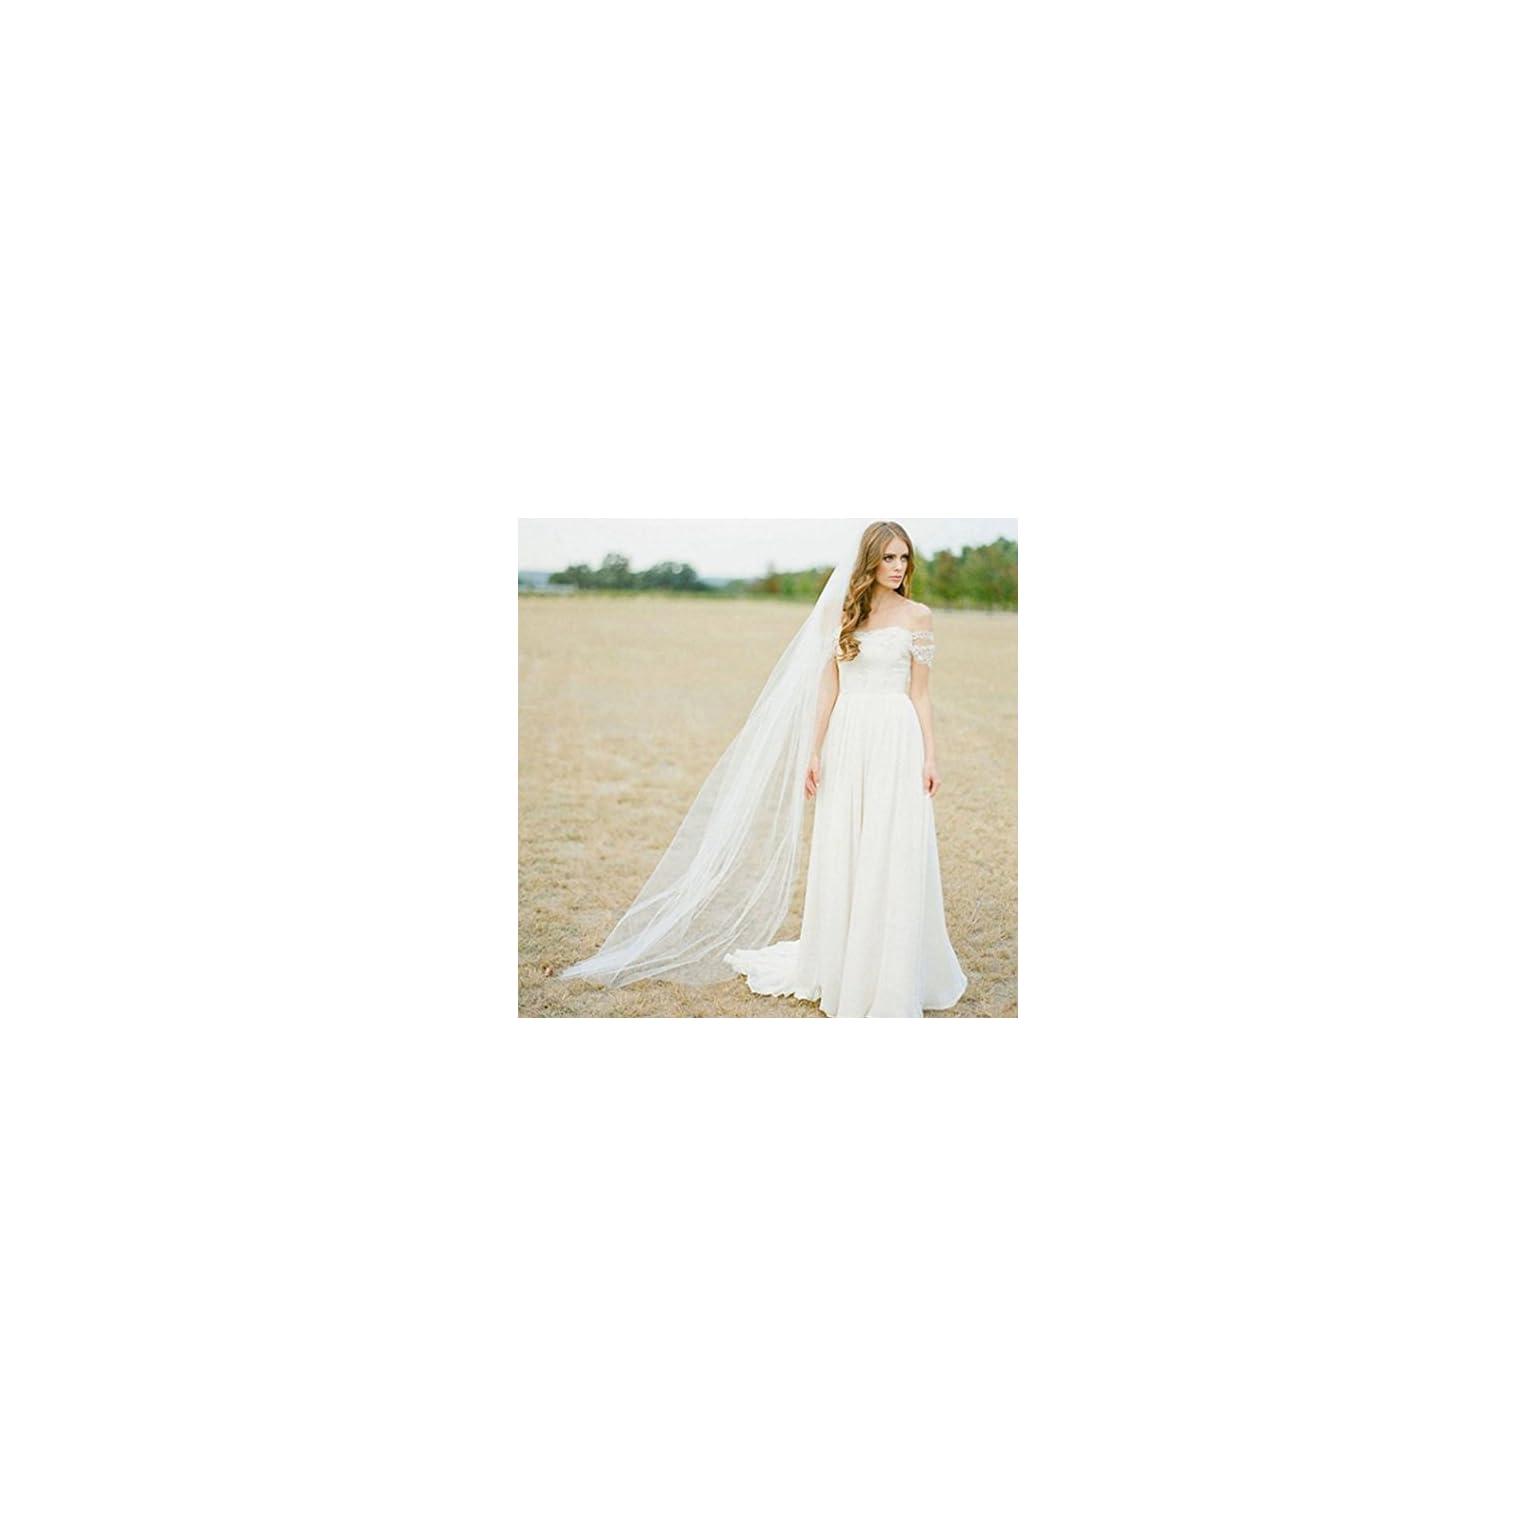 118W-118L,Ivory 118 Inches Barogirl Wedding Veil Comb Bridal Cathedral Veil 1 Tier Drop Veil Wedding Rhinestones Hair Comb for Brides